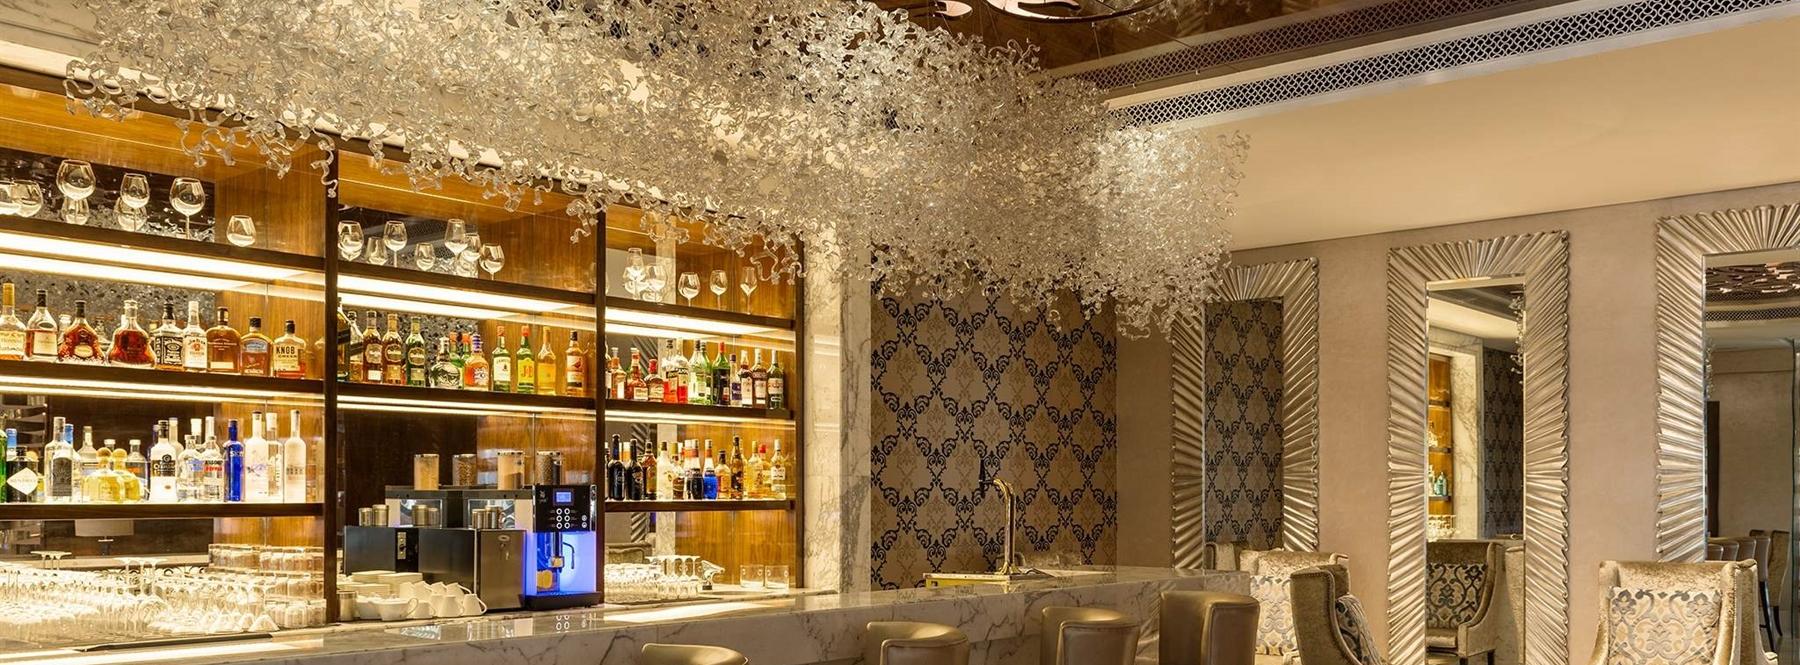 Vivaldi Italian Restaurant in Dubai